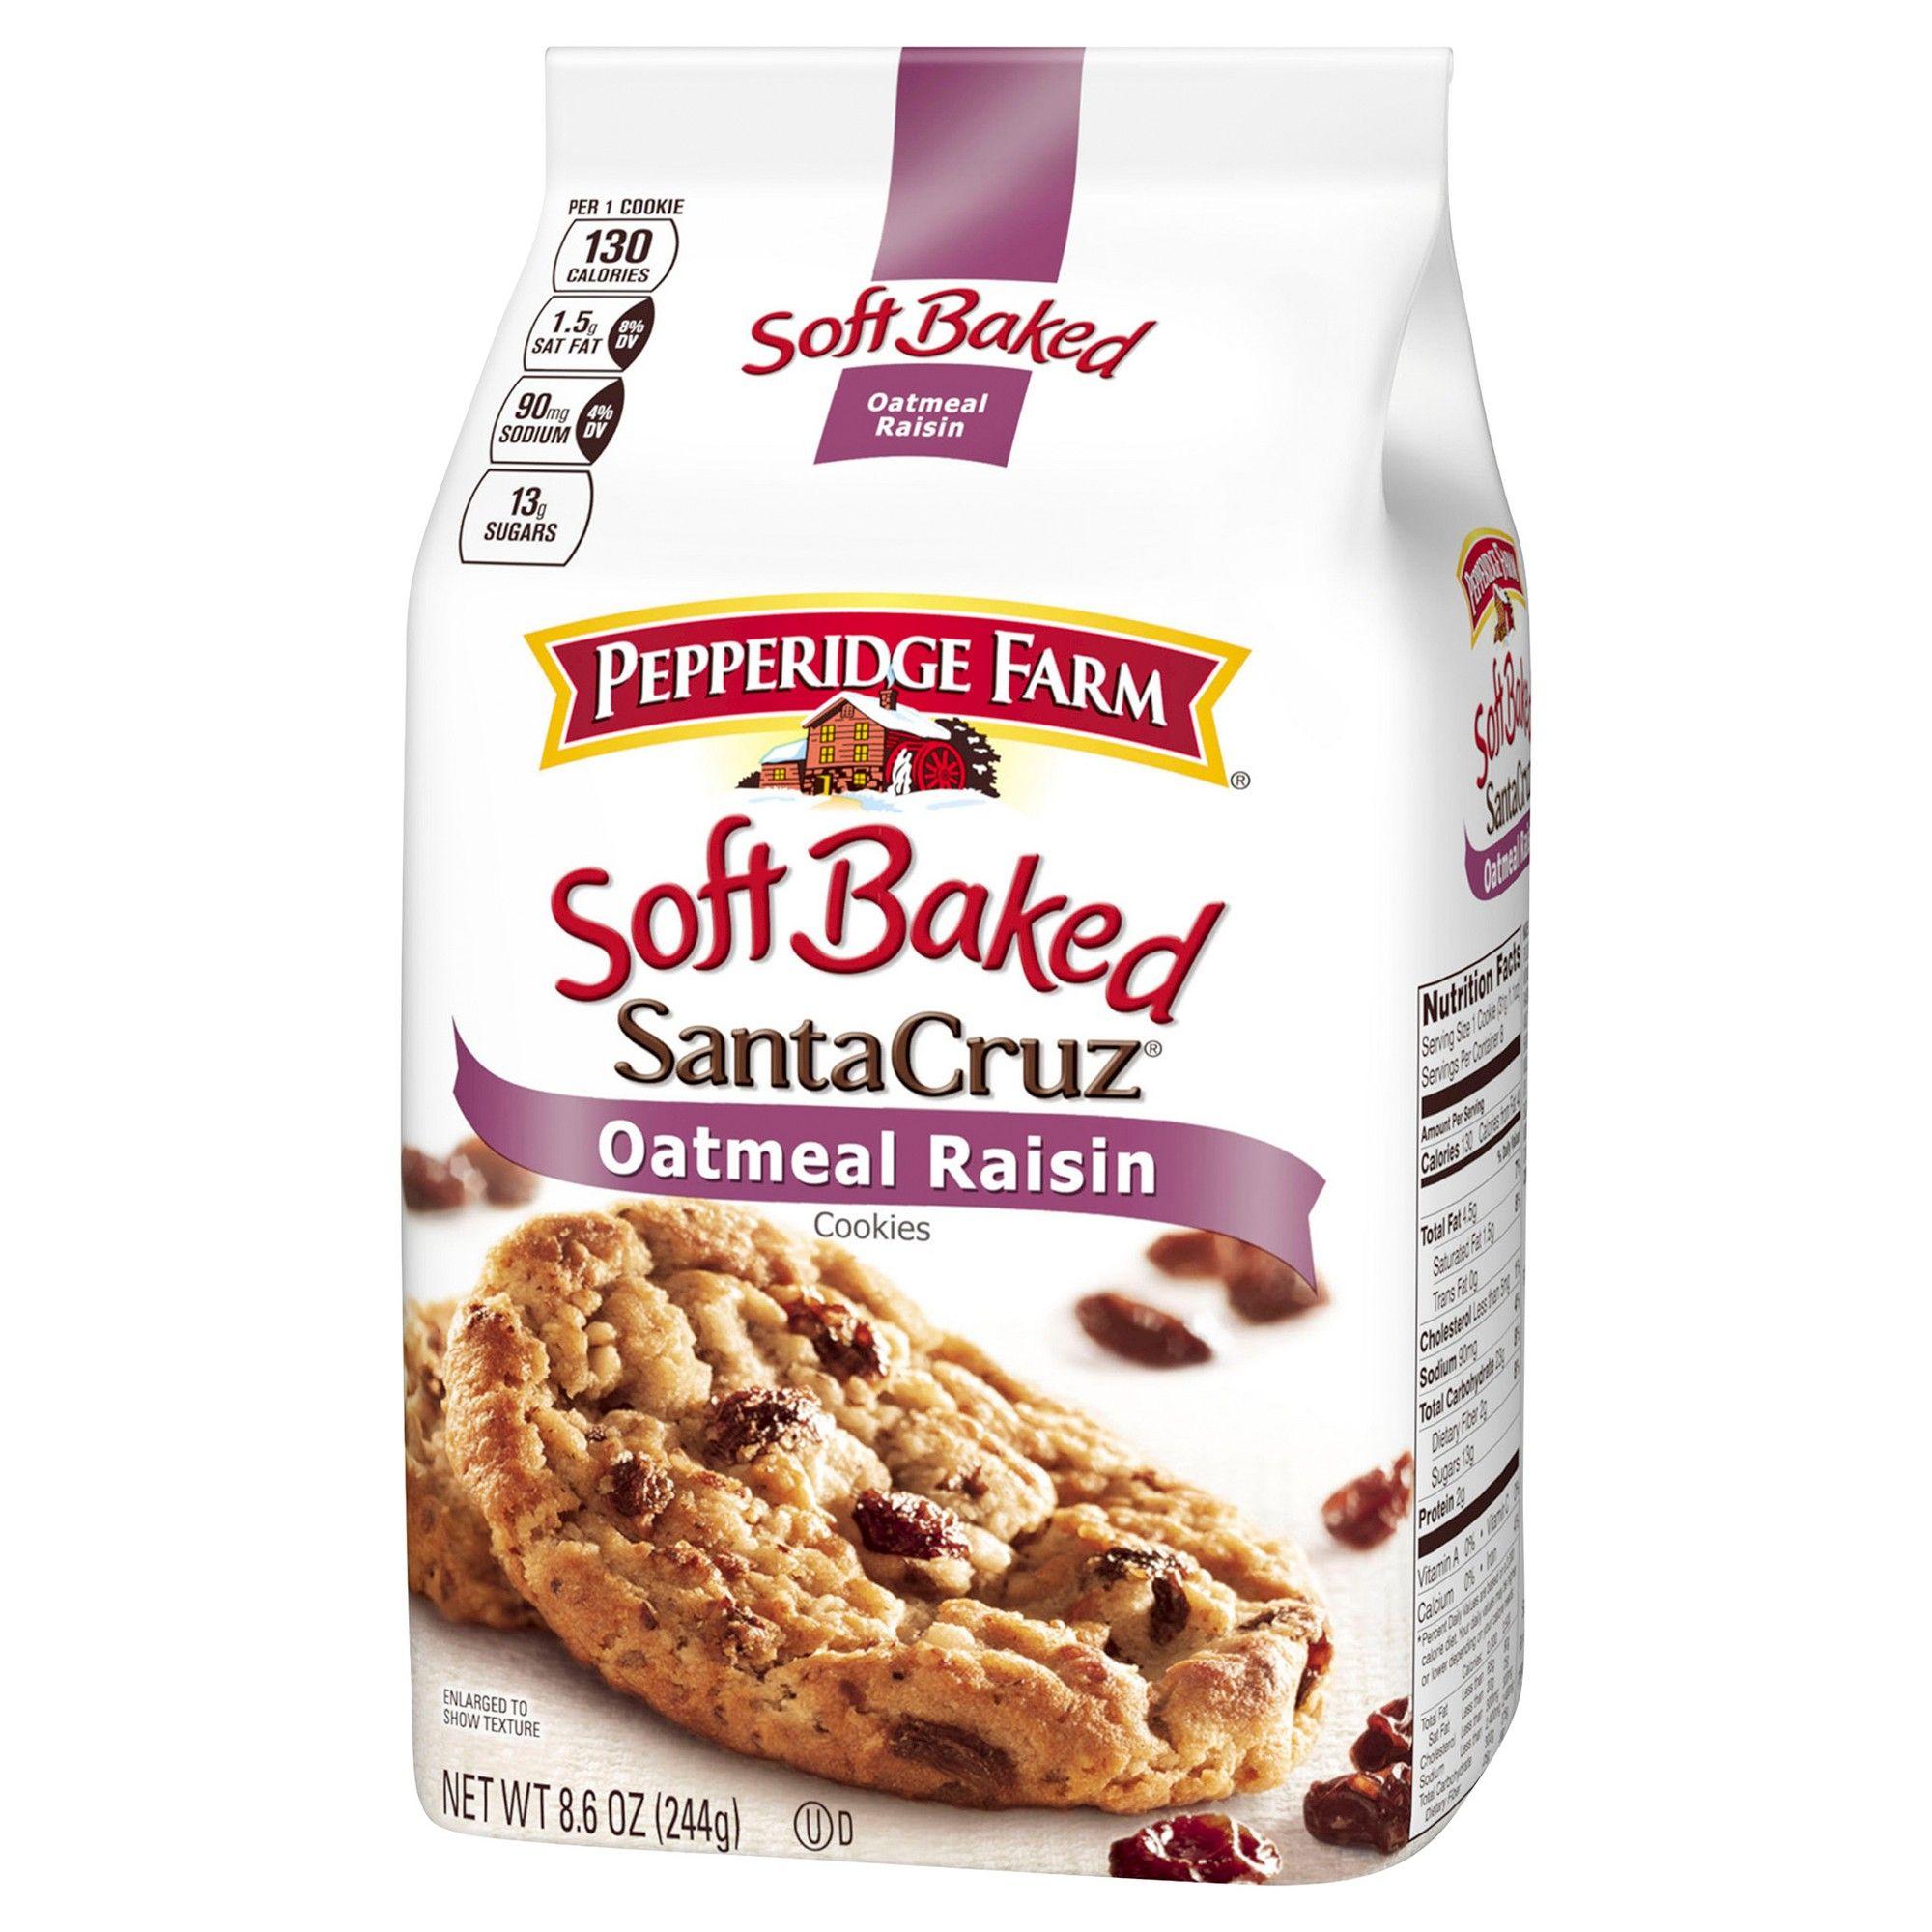 Pepperidge Farm Soft Baked Oatmeal Raisin Cookies 8.6oz